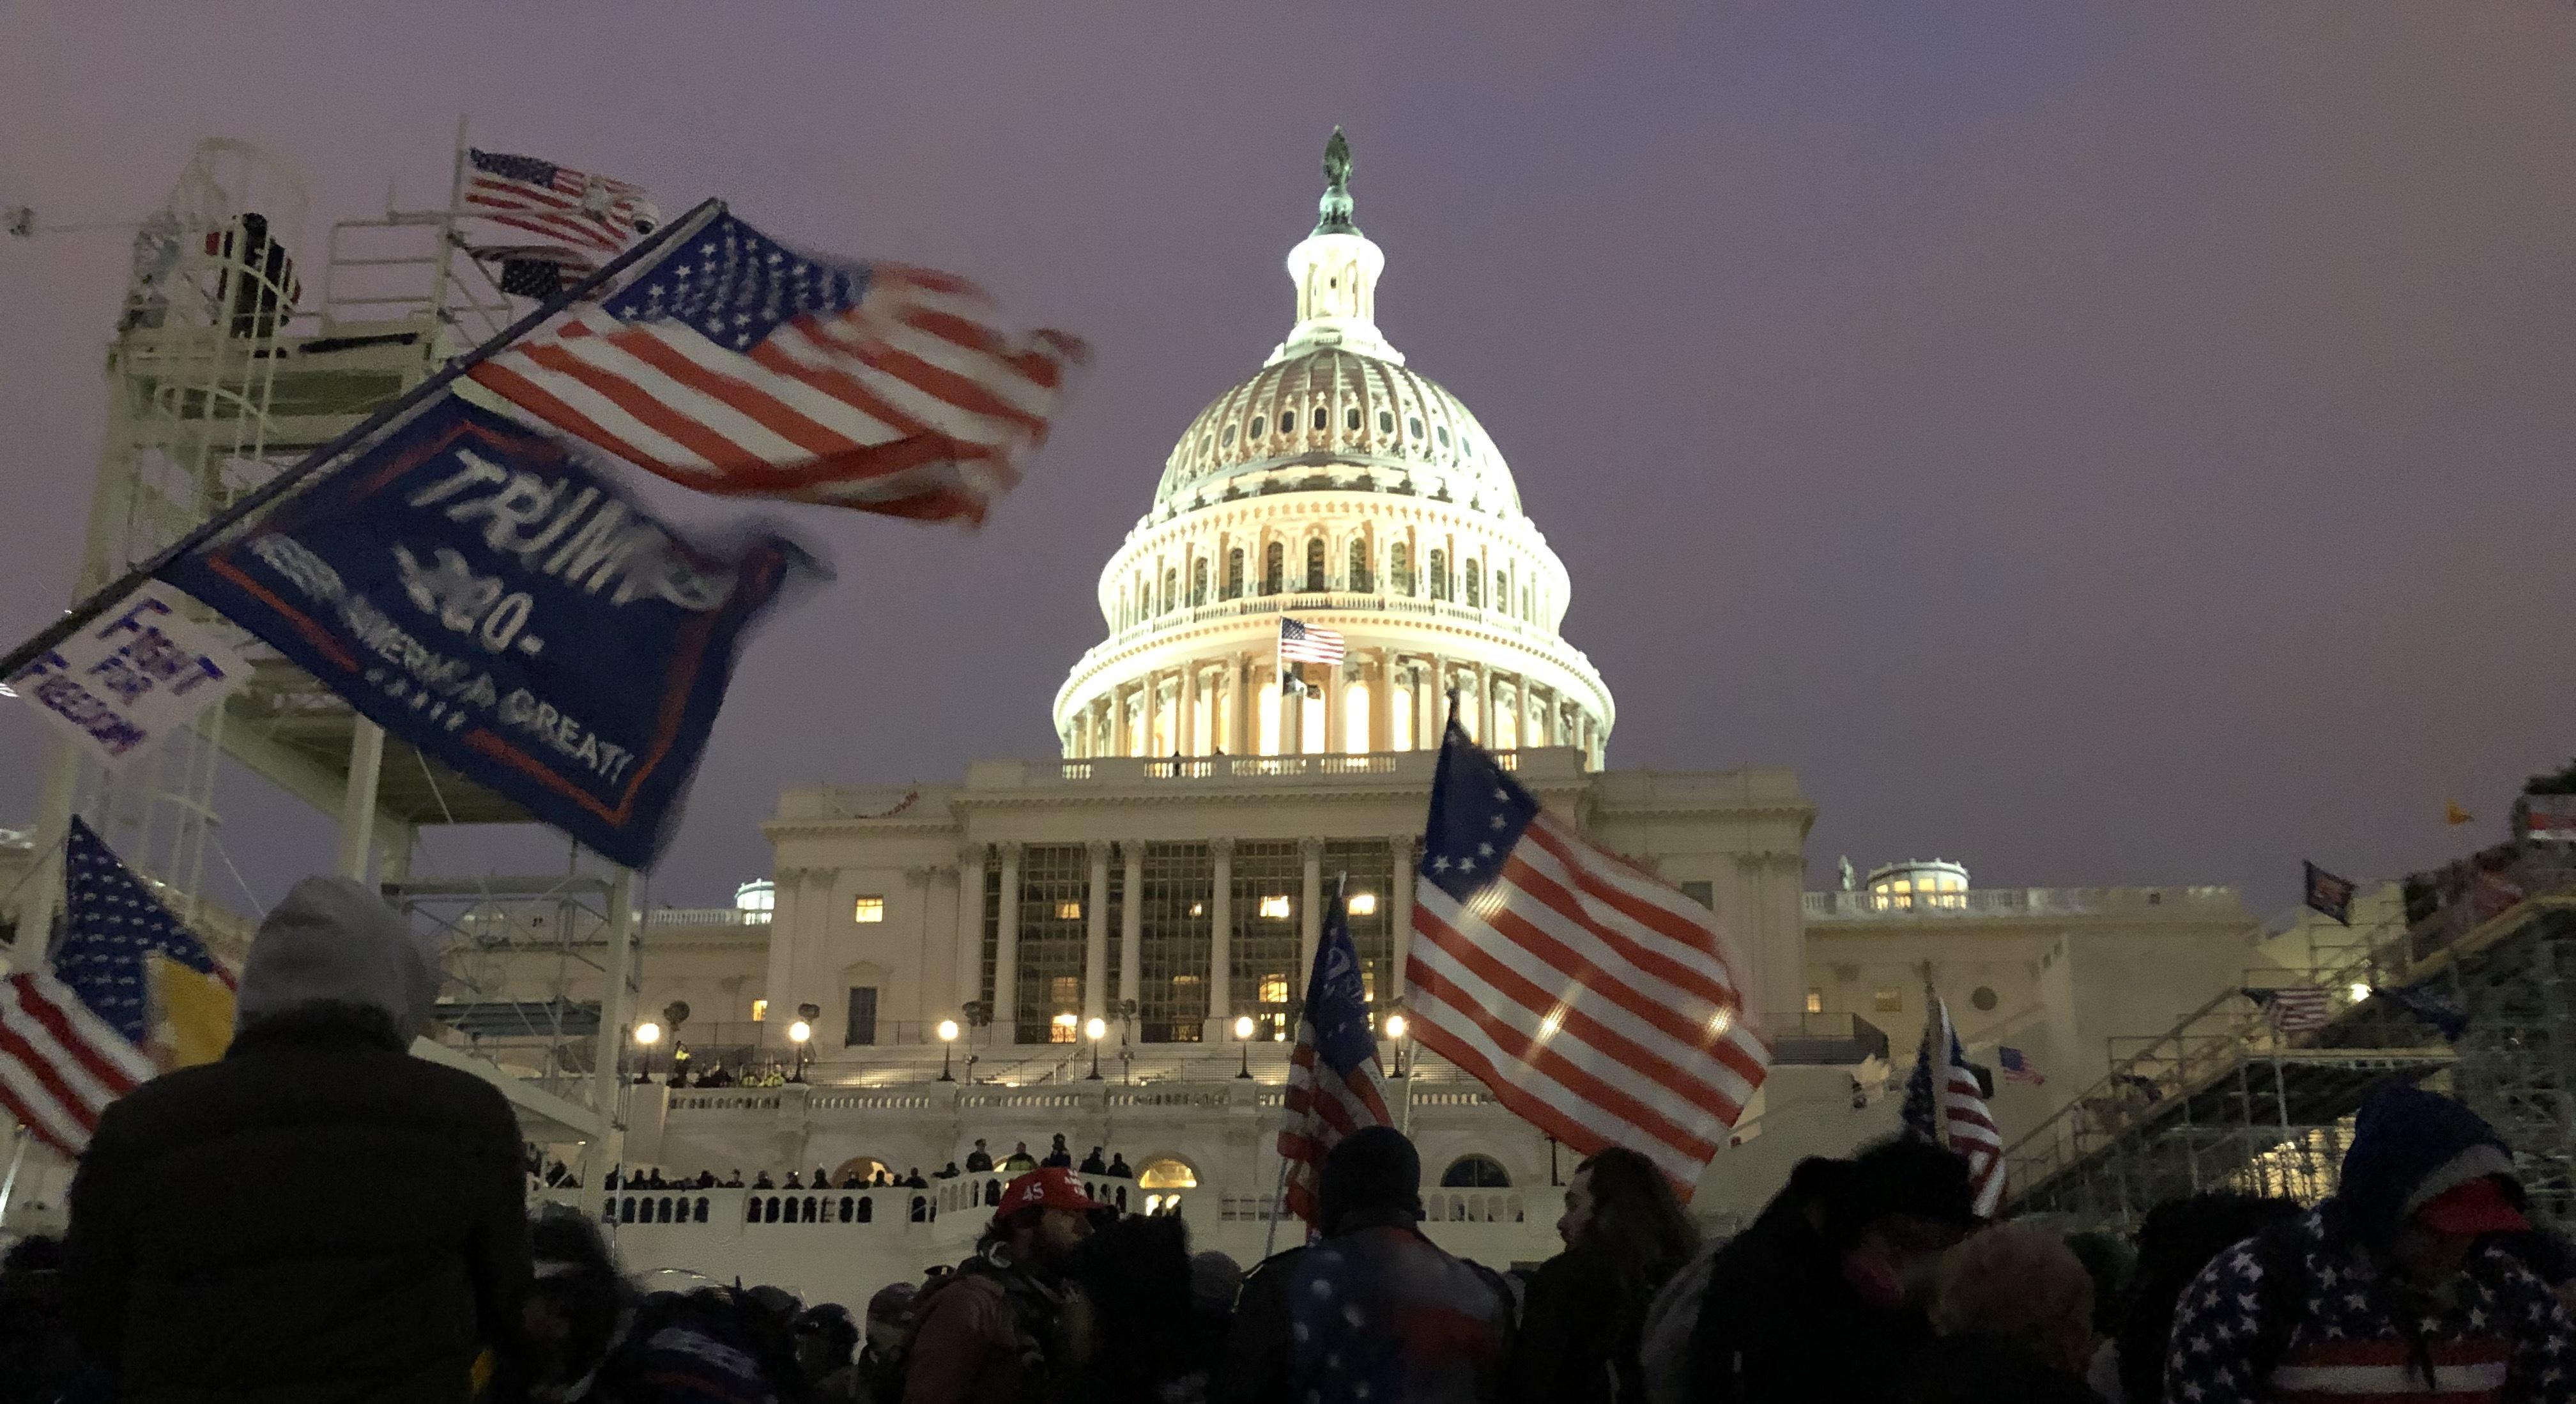 House Speaker Pelosi proposes commission to investigate Capitol attacks